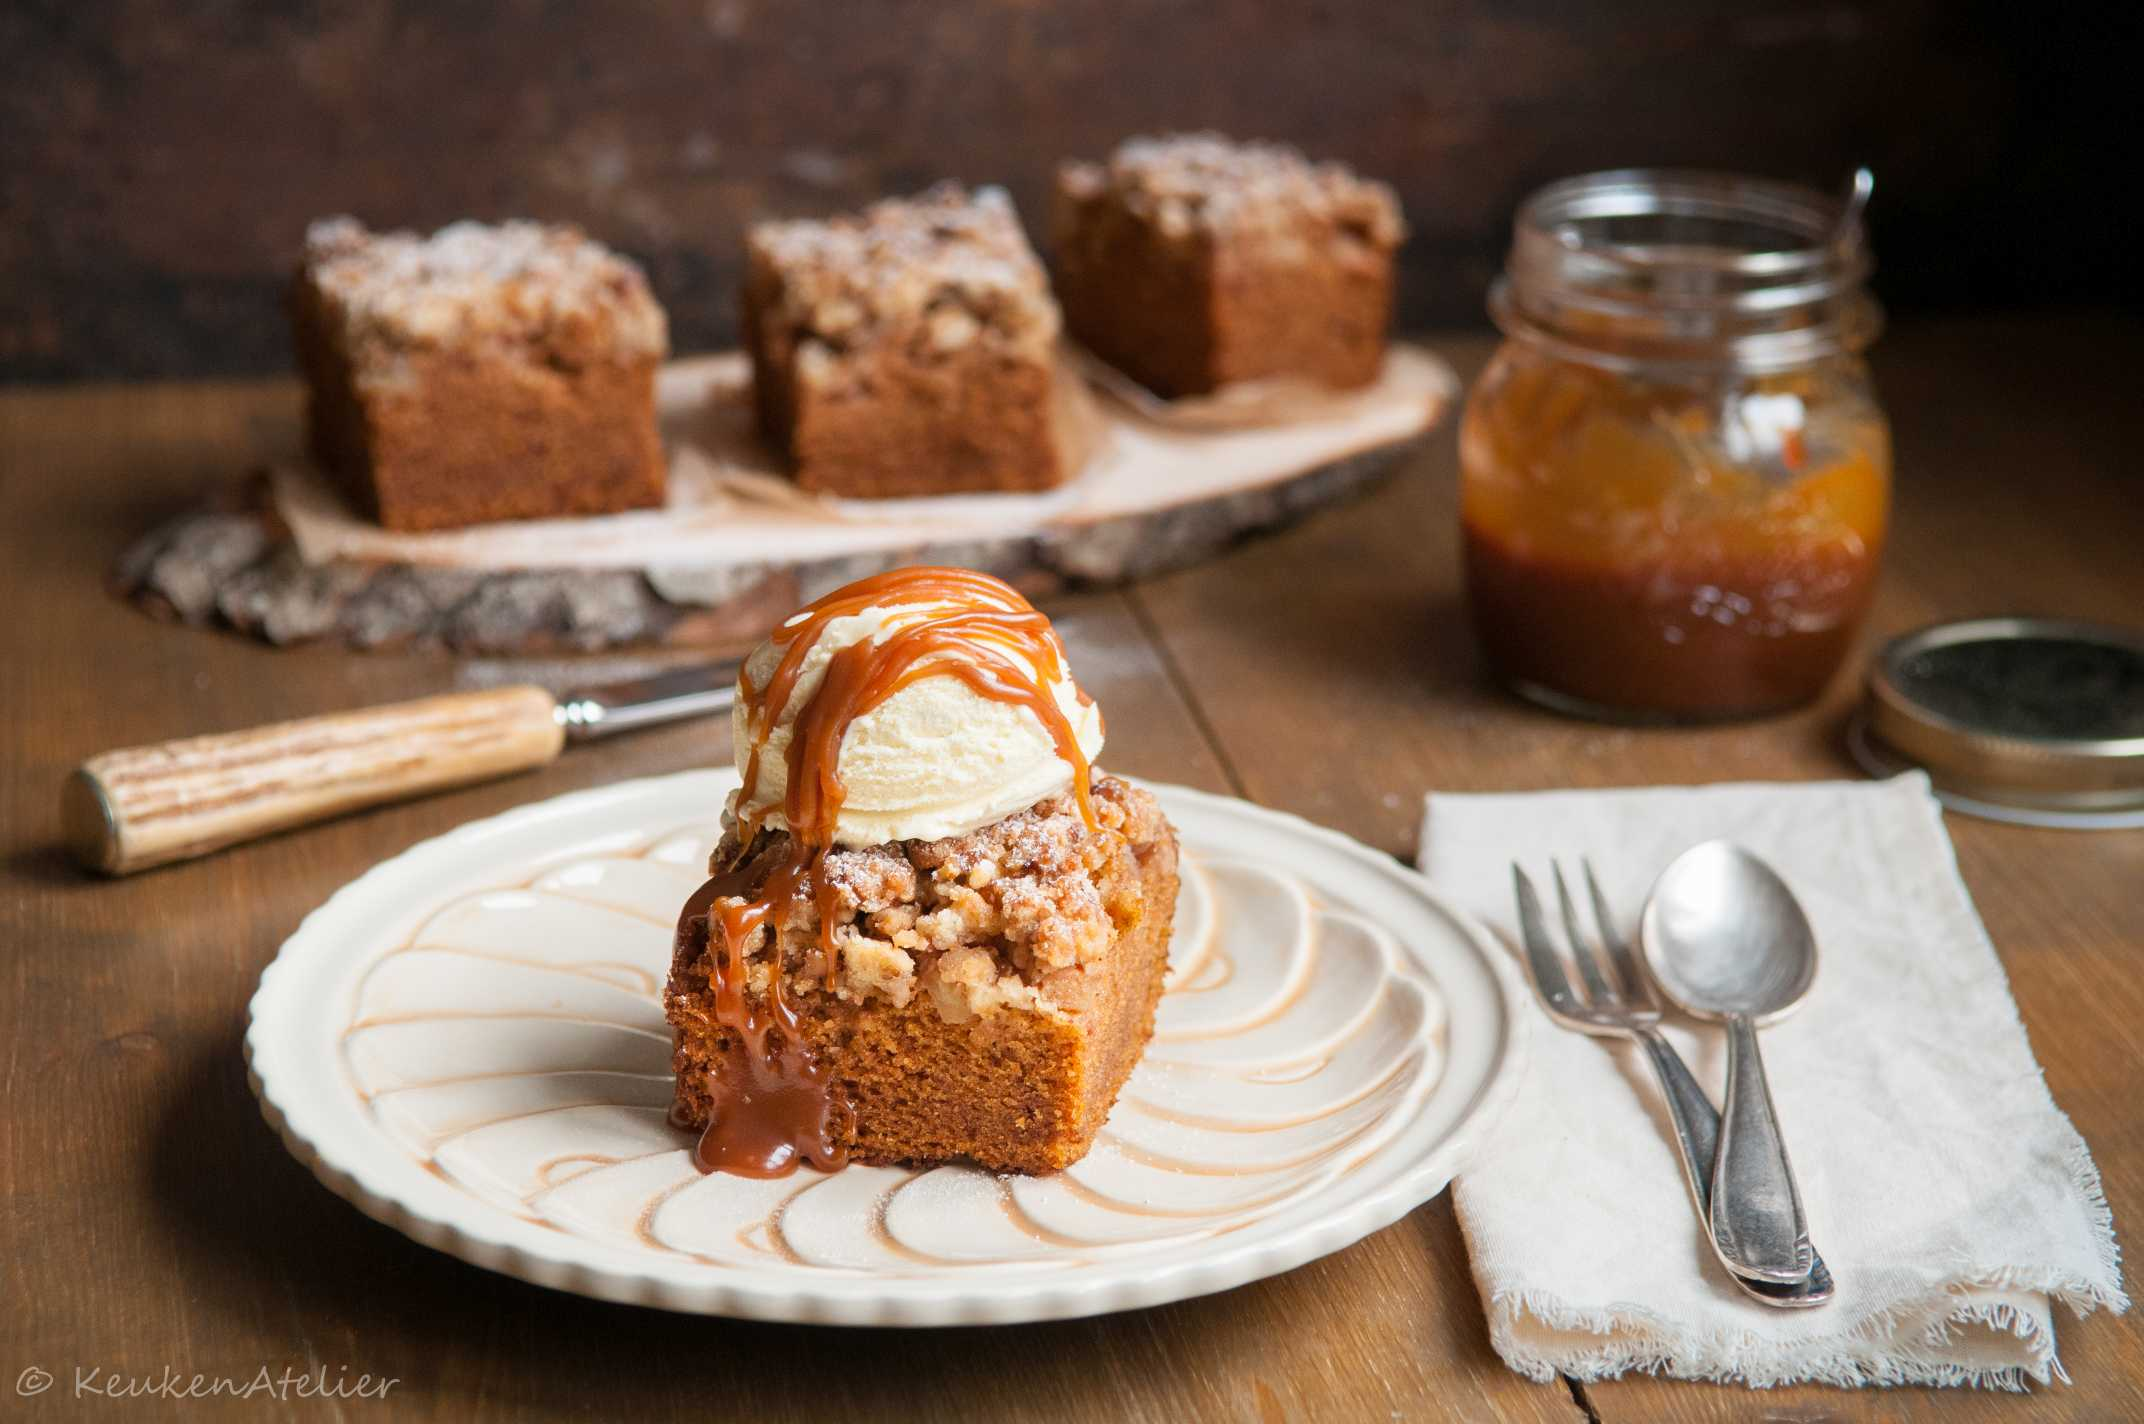 pompoencake met appel en pecankruimel 3e | KeukenAtelier